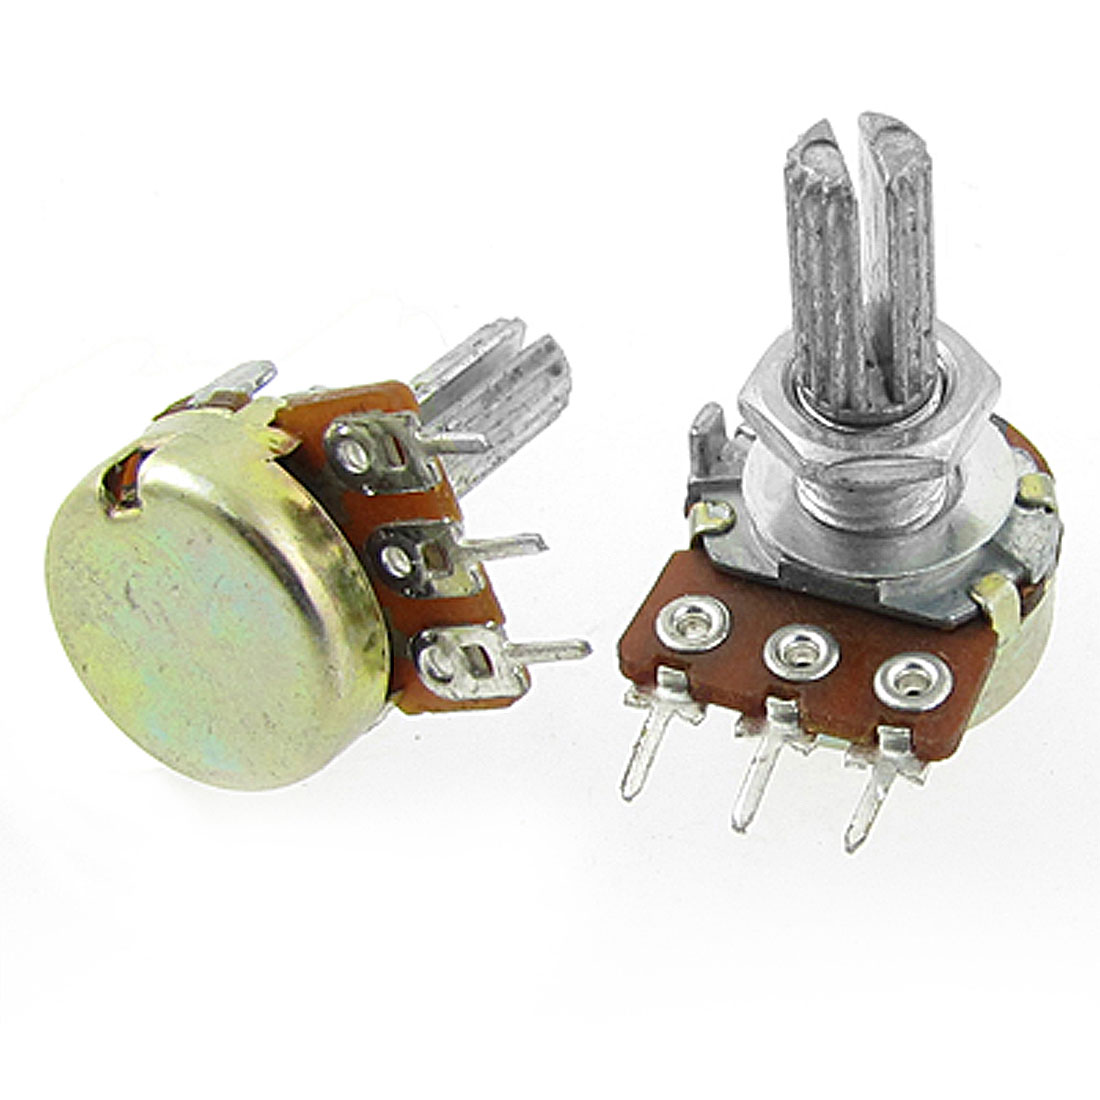 5 Pcs Silver Tone Metal Split Shaft Potentiometer 100K Ohm